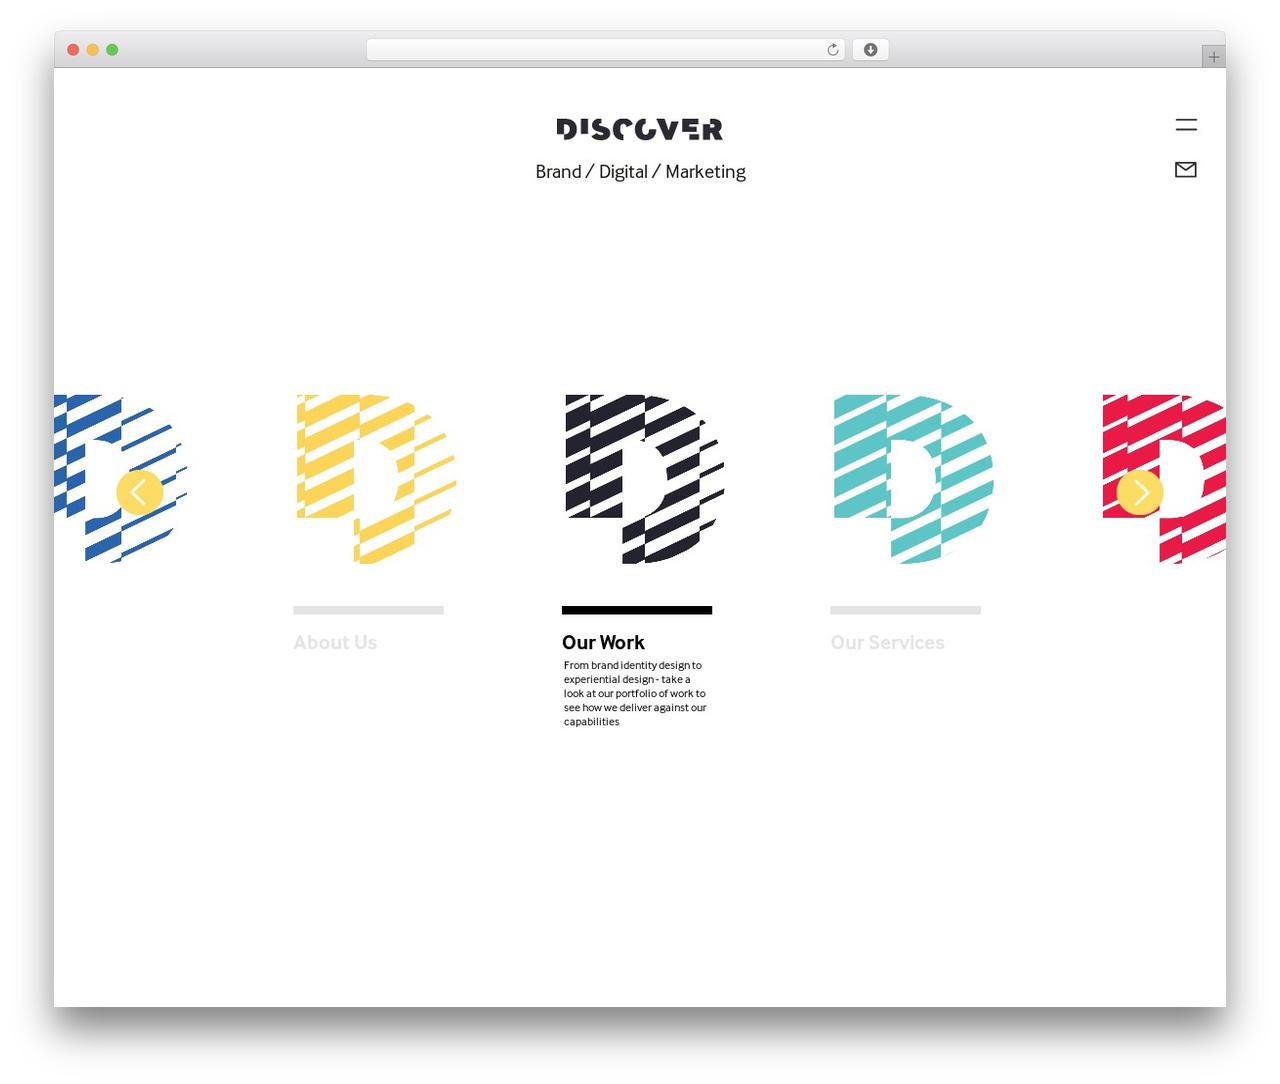 WordPress theme Discover Brand Creation - discoverbrandcreation.com